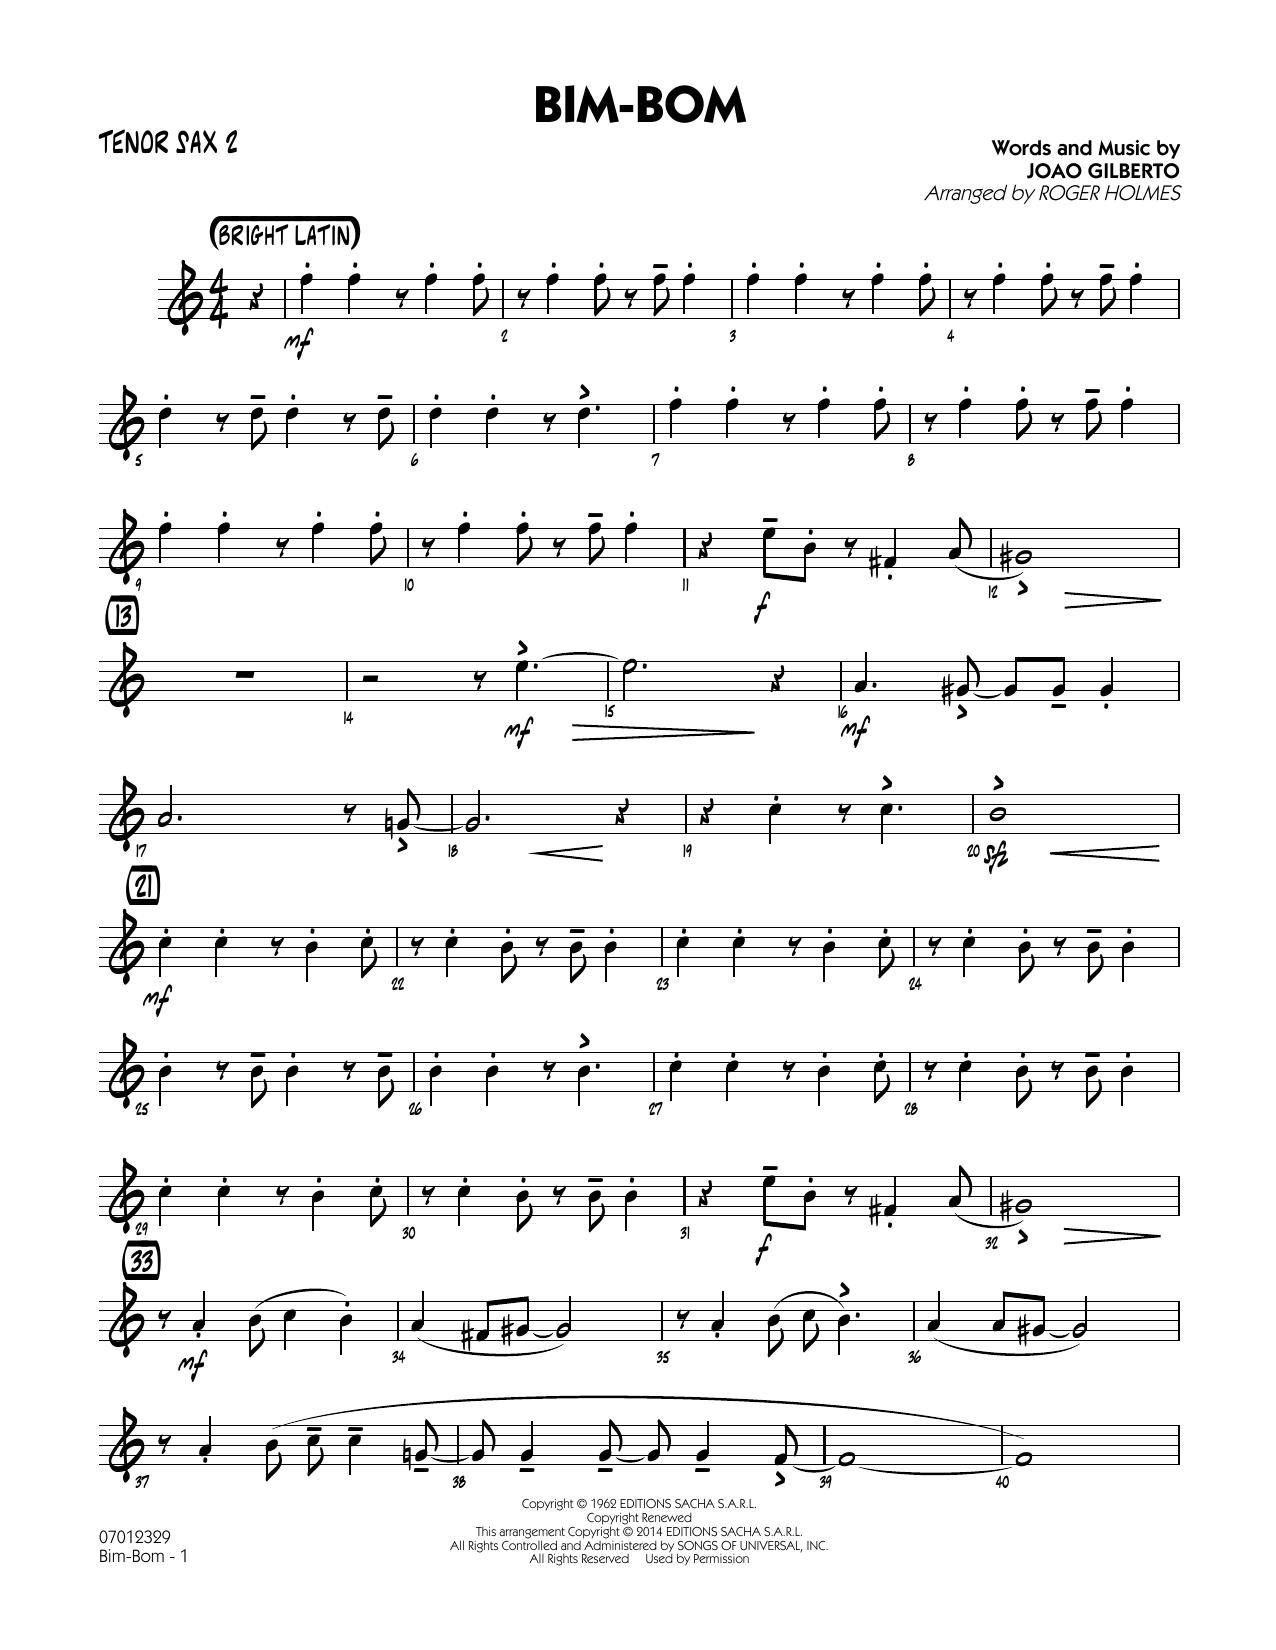 Roger Holmes Bim-Bom - Tenor Sax 2 sheet music notes and chords. Download Printable PDF.